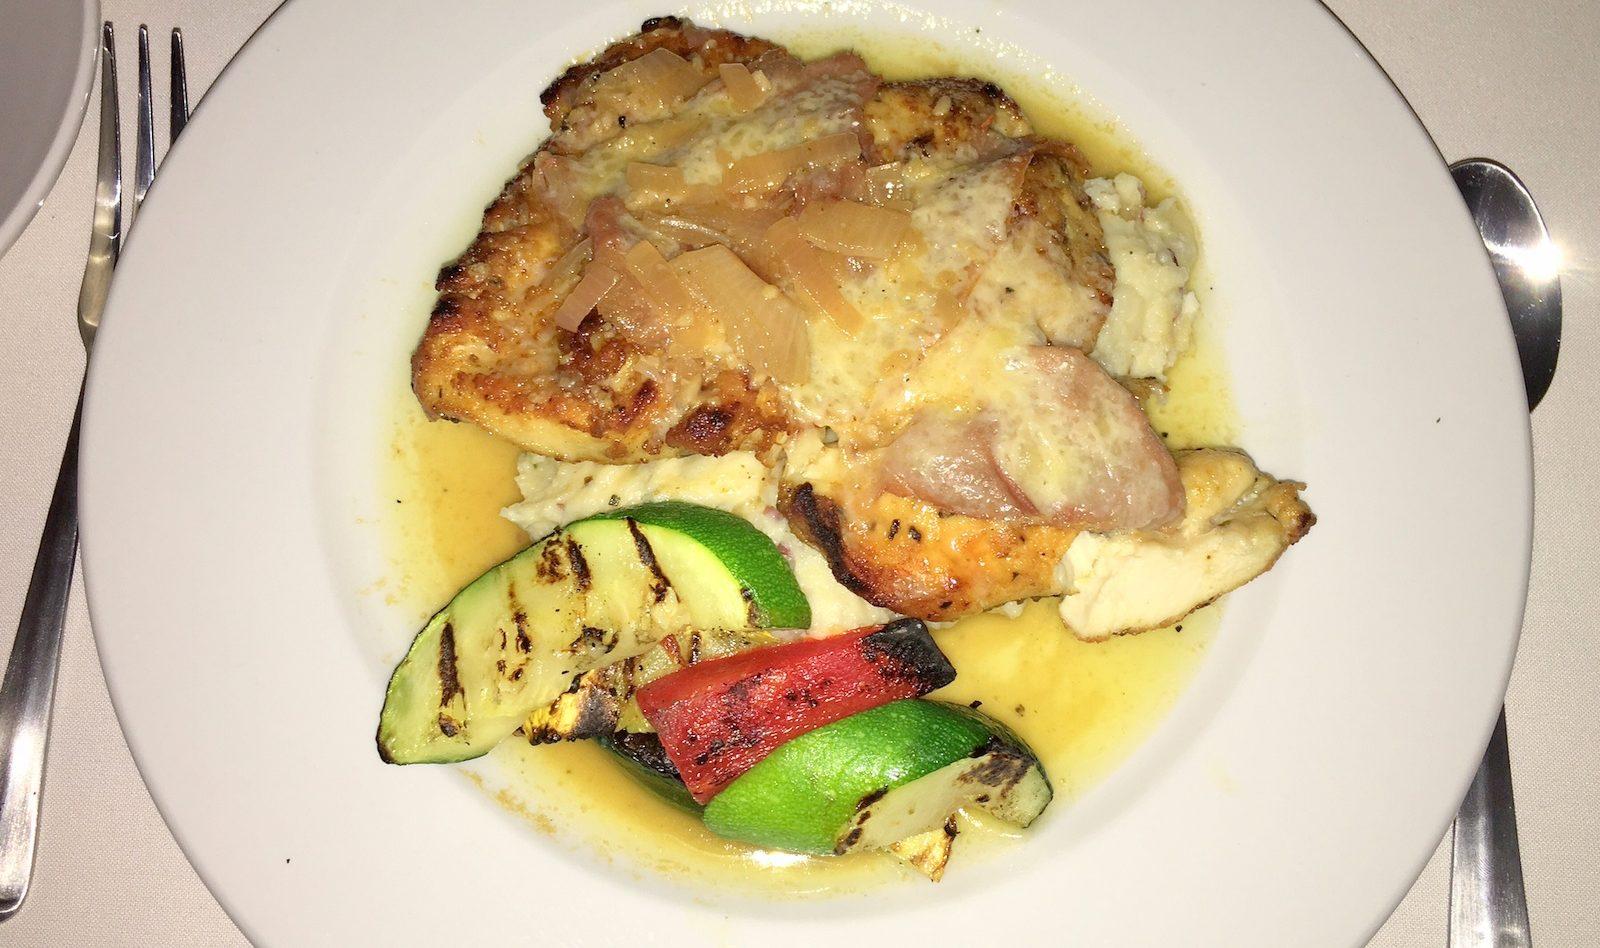 Bellini Bistro's chicken saltimbocca is served with garlic mashed potatoes. (Photo: Bellini's Bistro)